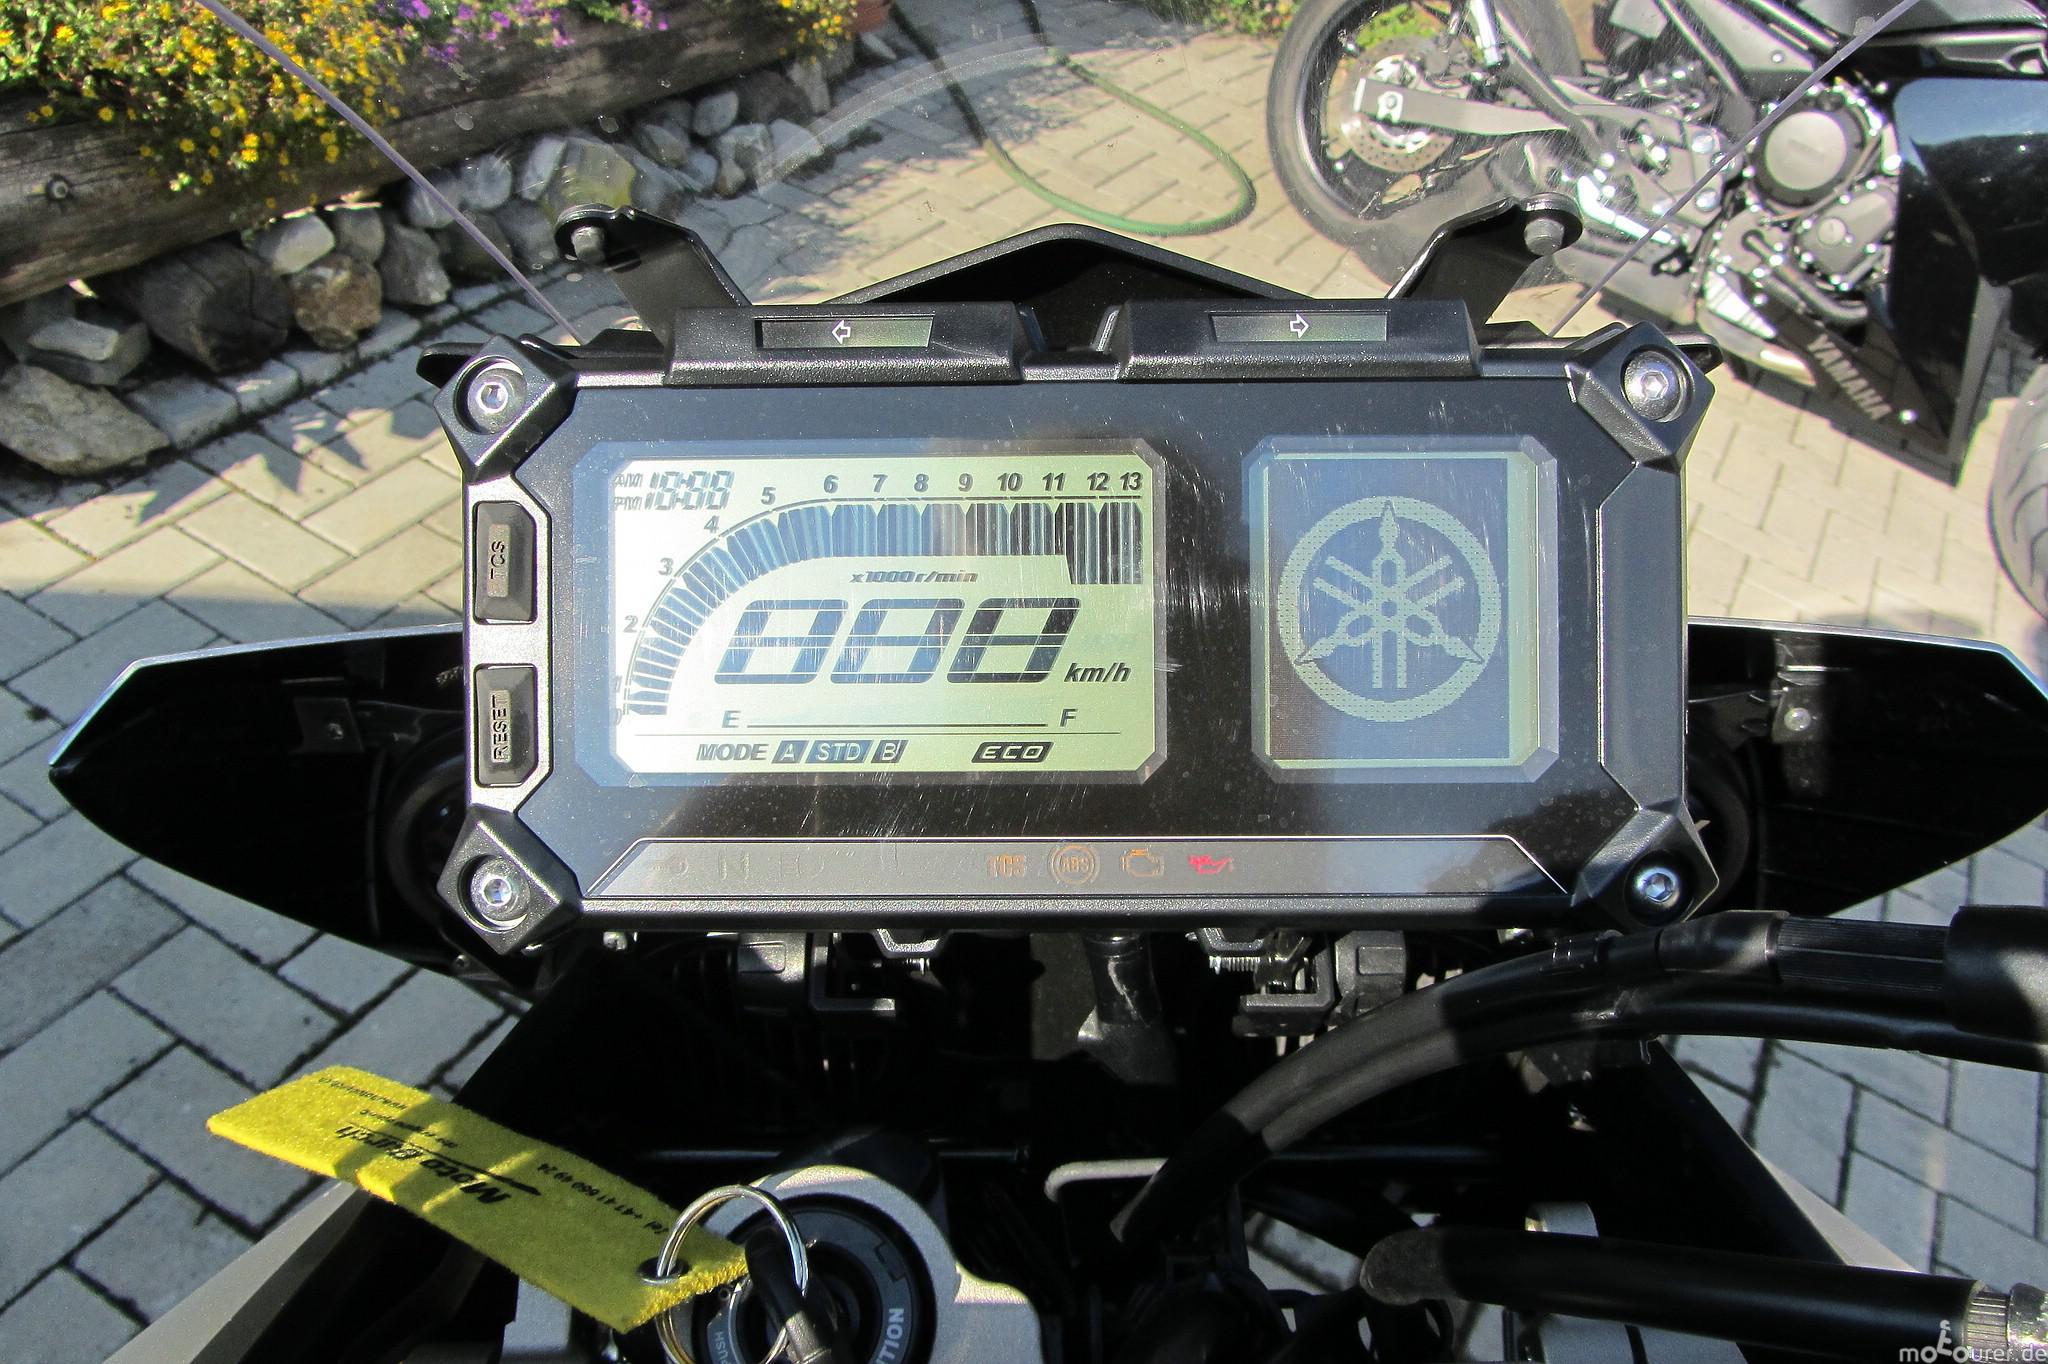 Yamaha MT-09 Tracer Cockpit